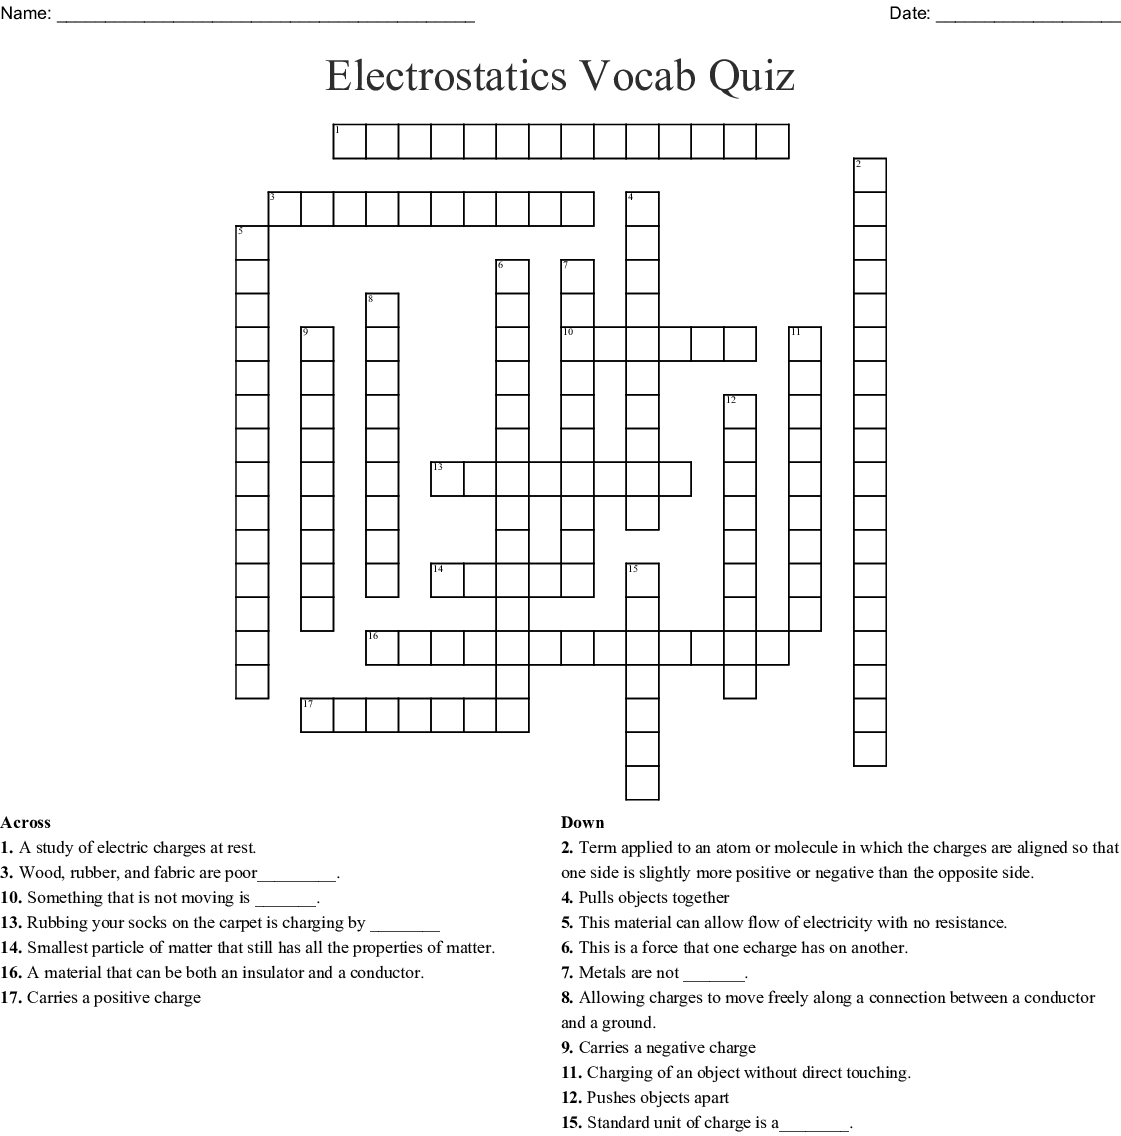 Electrostatics Vocab Quiz Crossword - Wordmint - Printable Vocabulary Quiz Crossword Puzzle